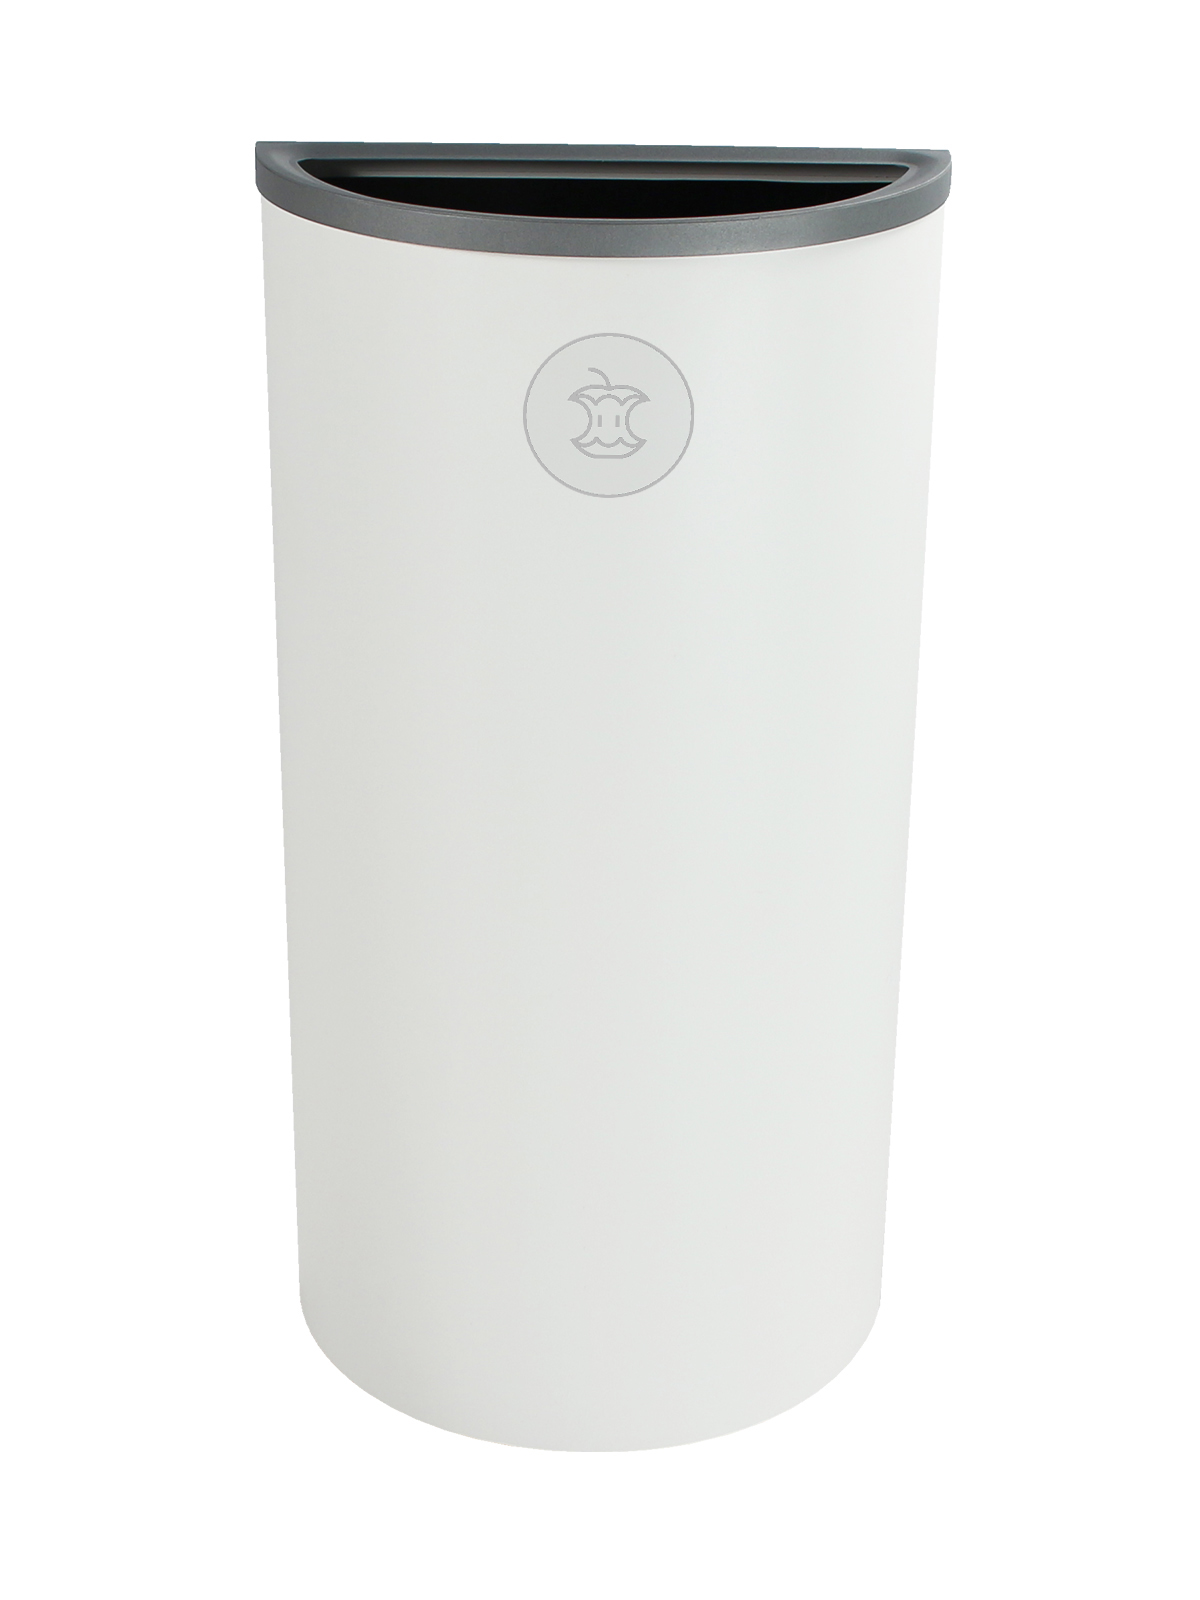 SPECTRUM - Single - Ellipse Slim - Organics - Full - White